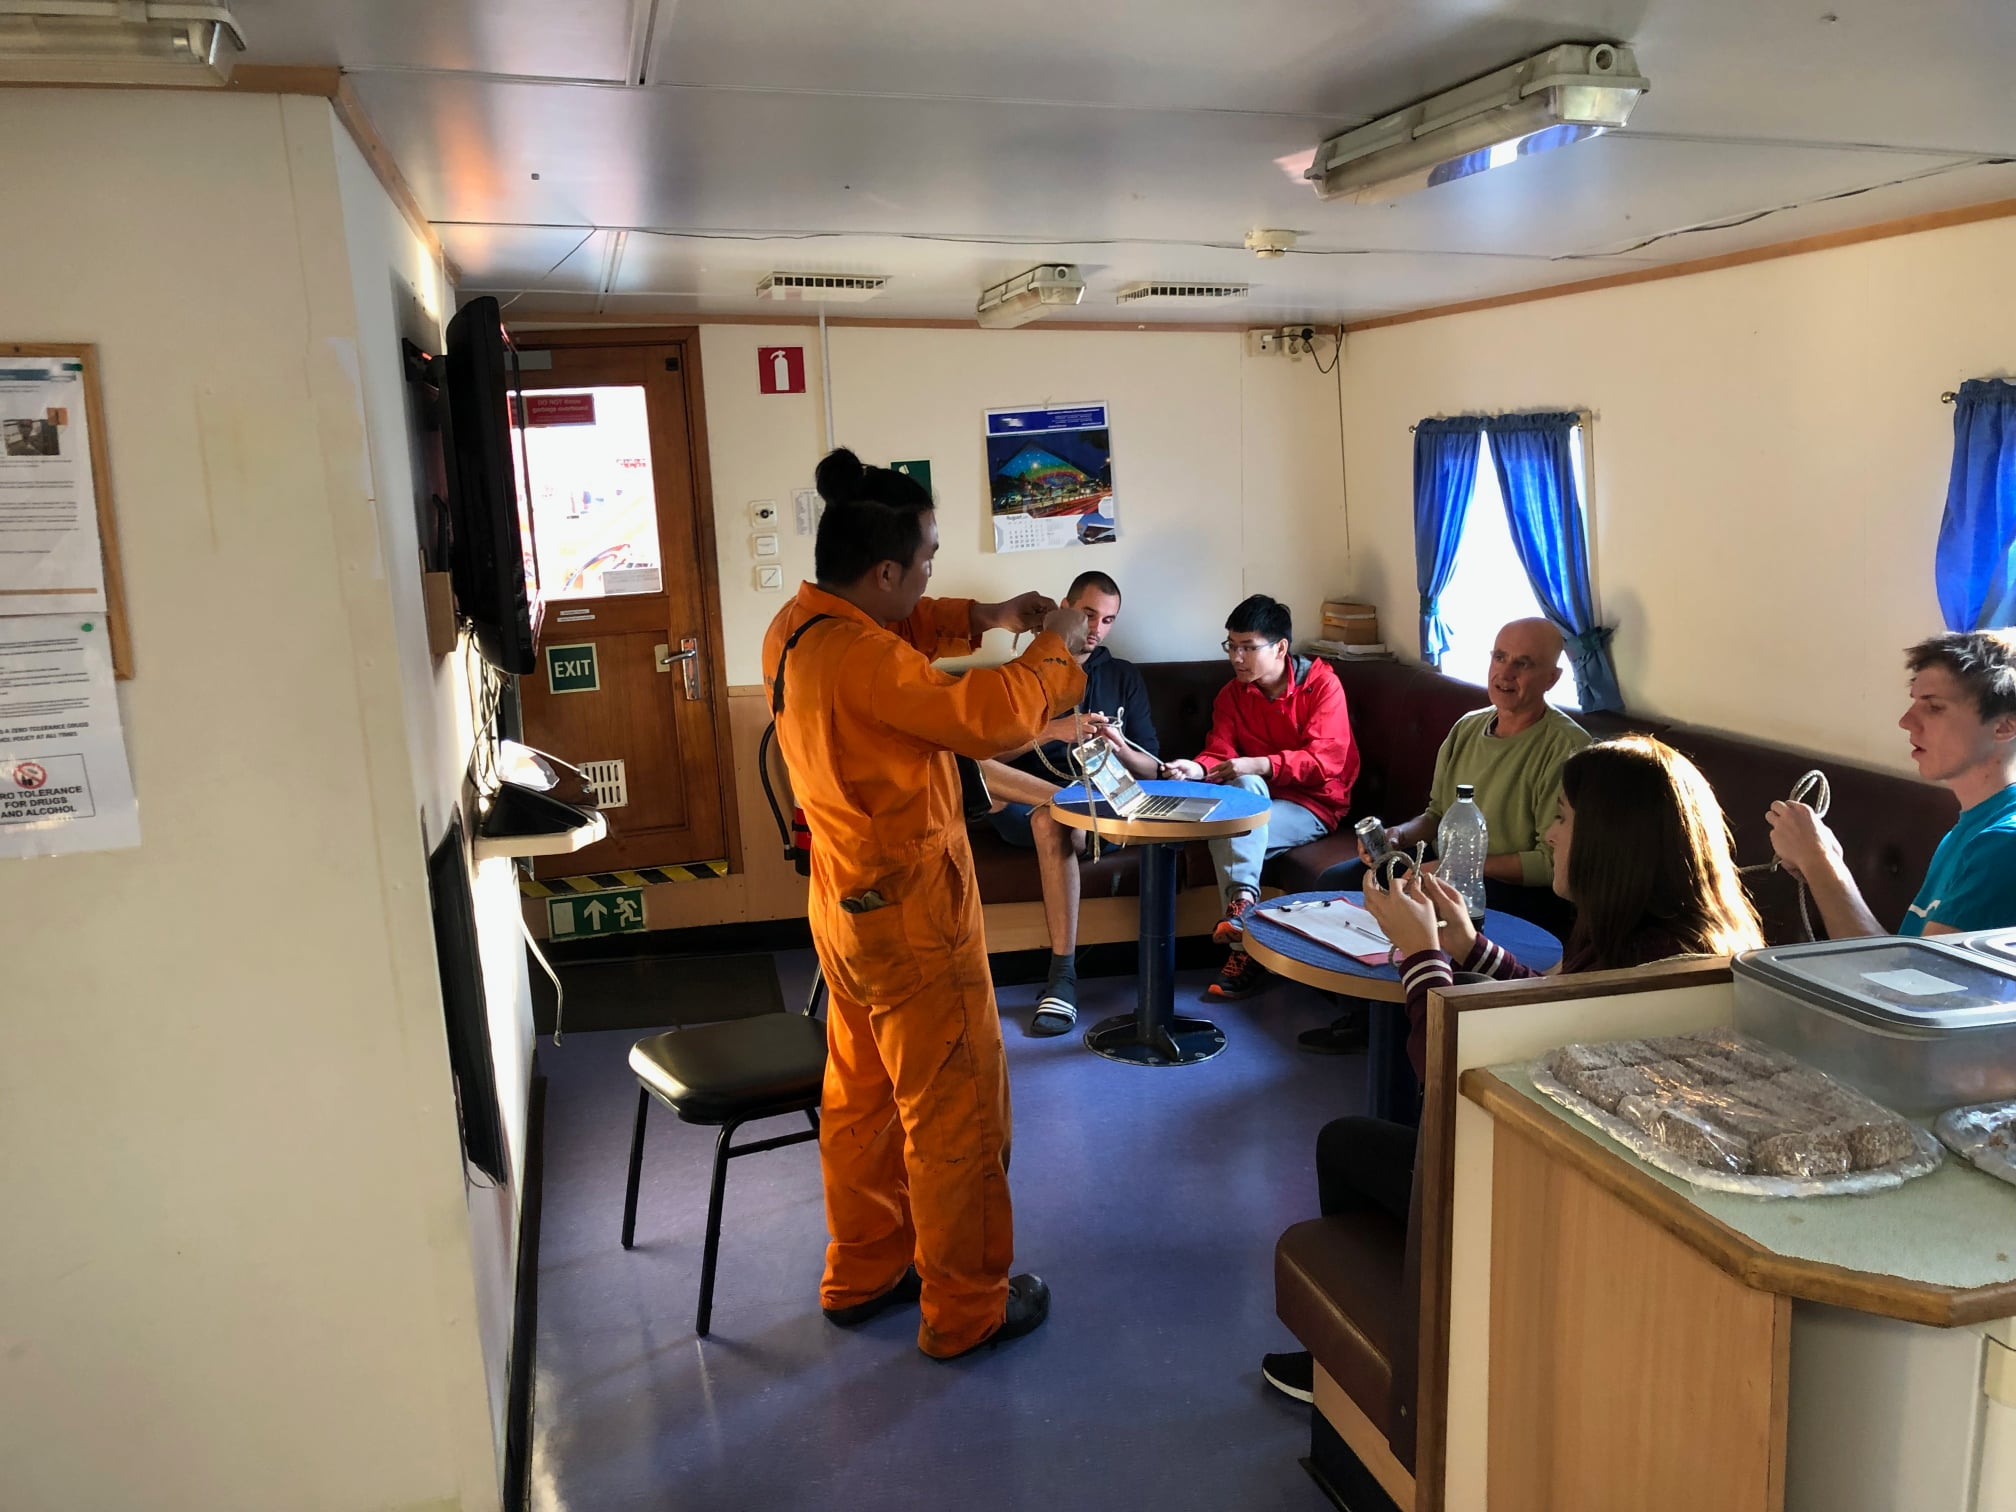 Training on board